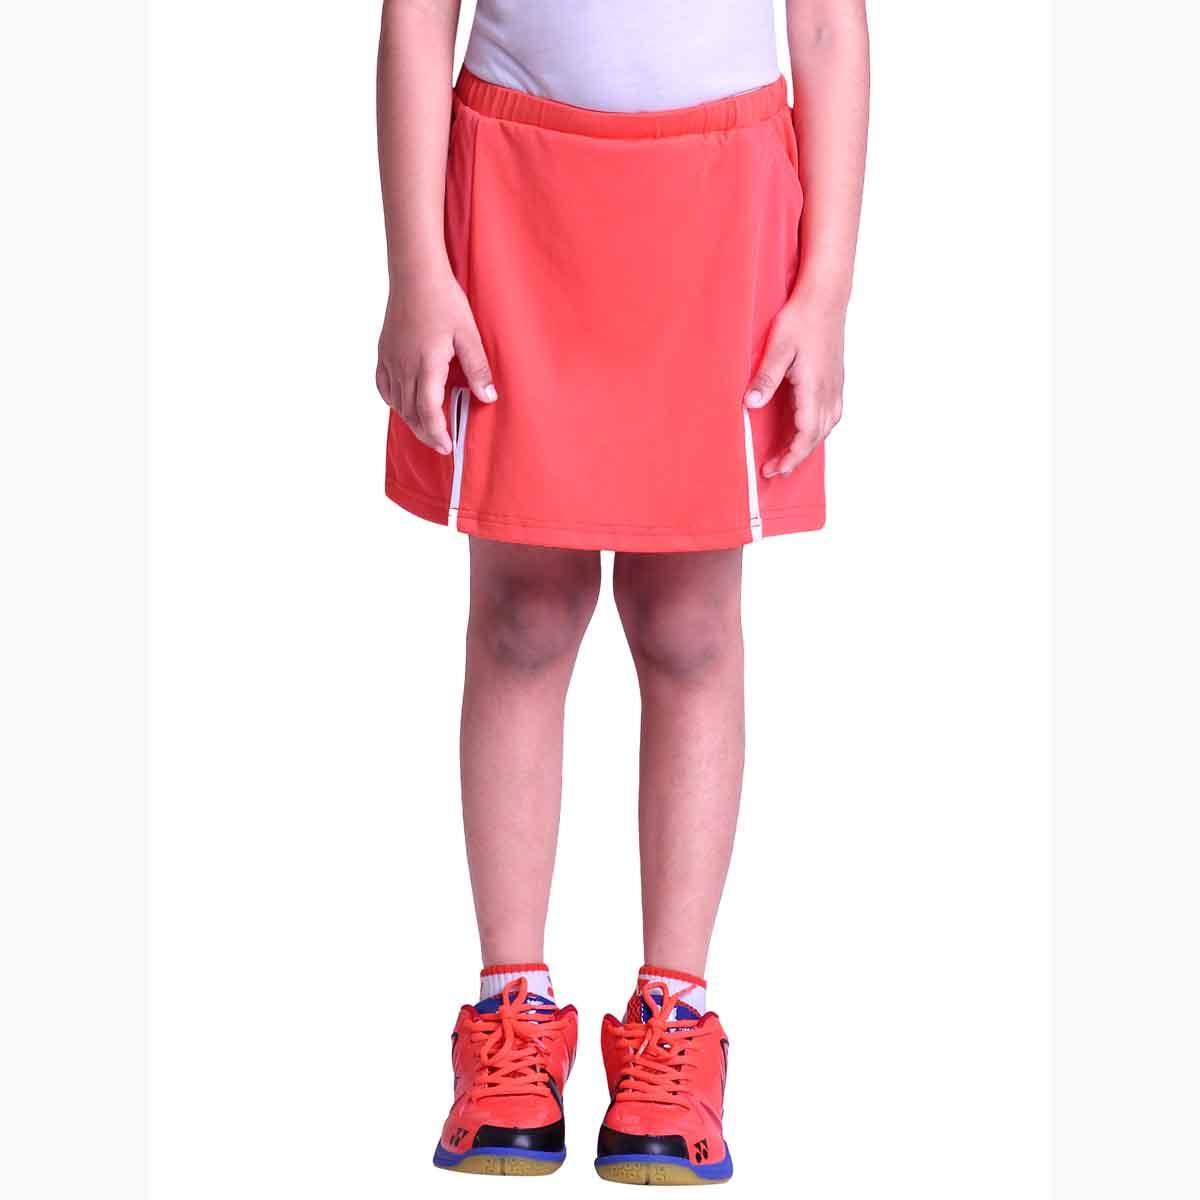 Buy Yonex Junior Girls Skorts Hot Coral 857 Online India